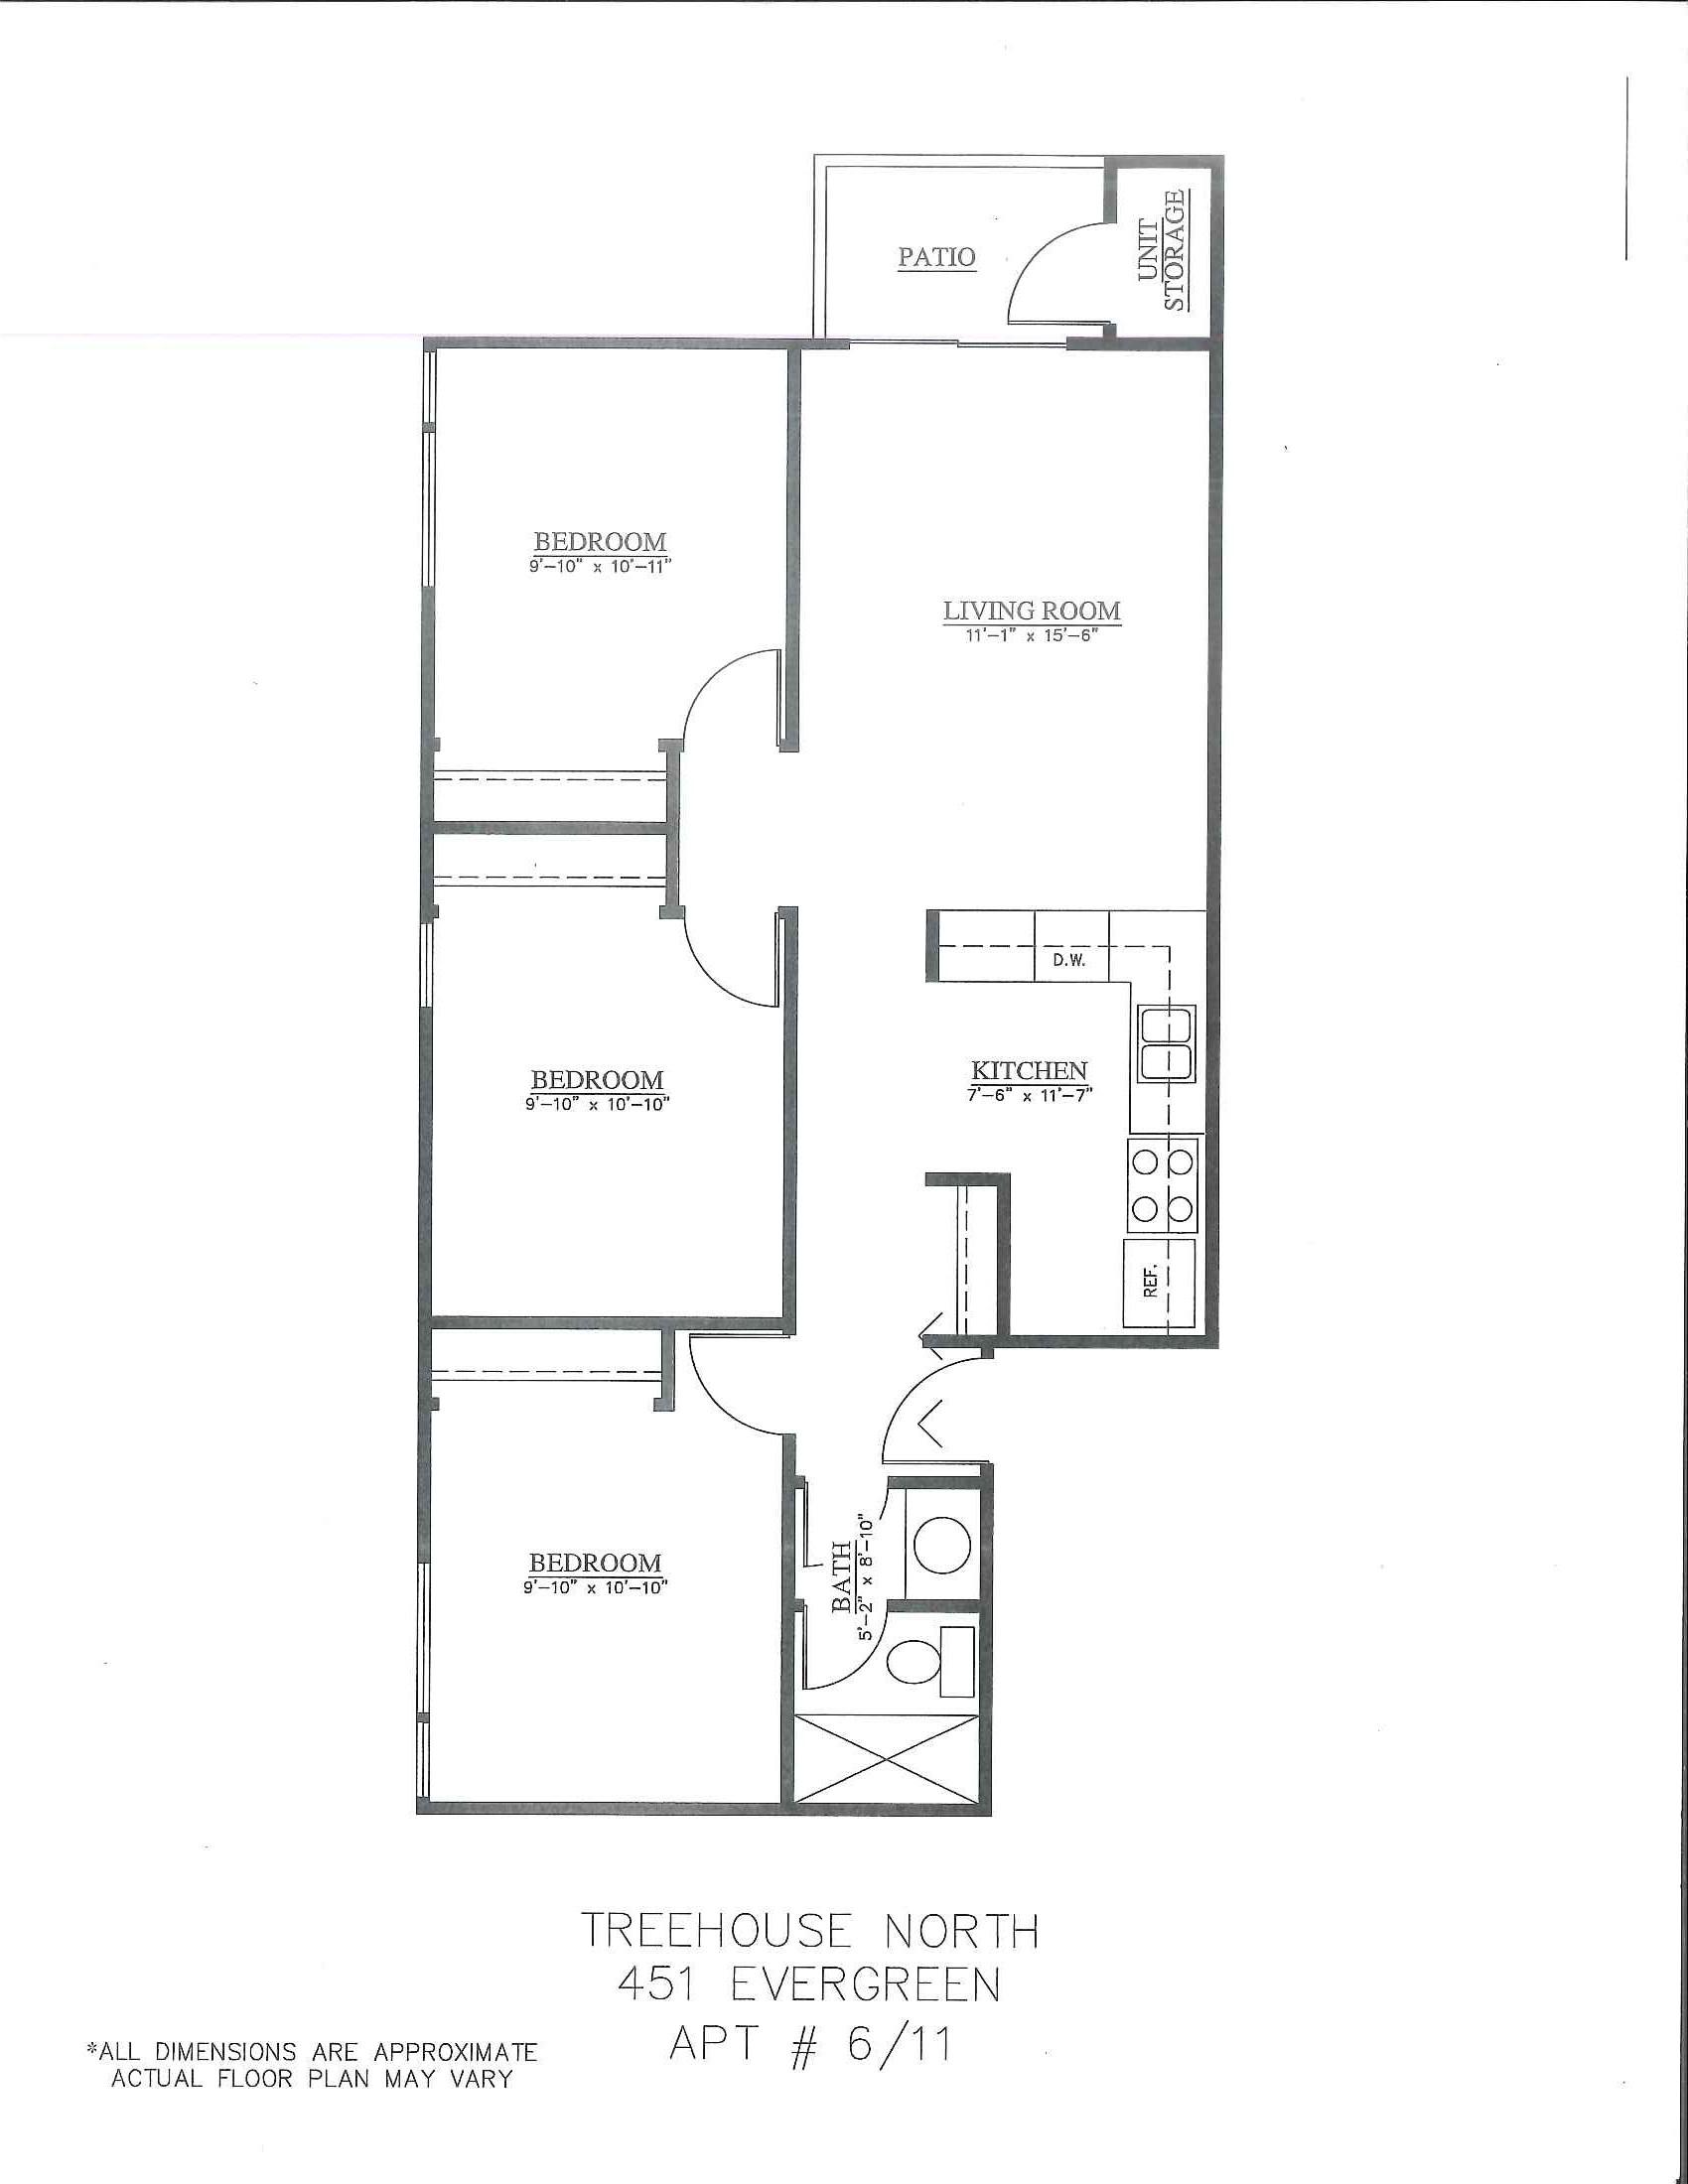 North 3 Bed Floorplan_0001.jpg